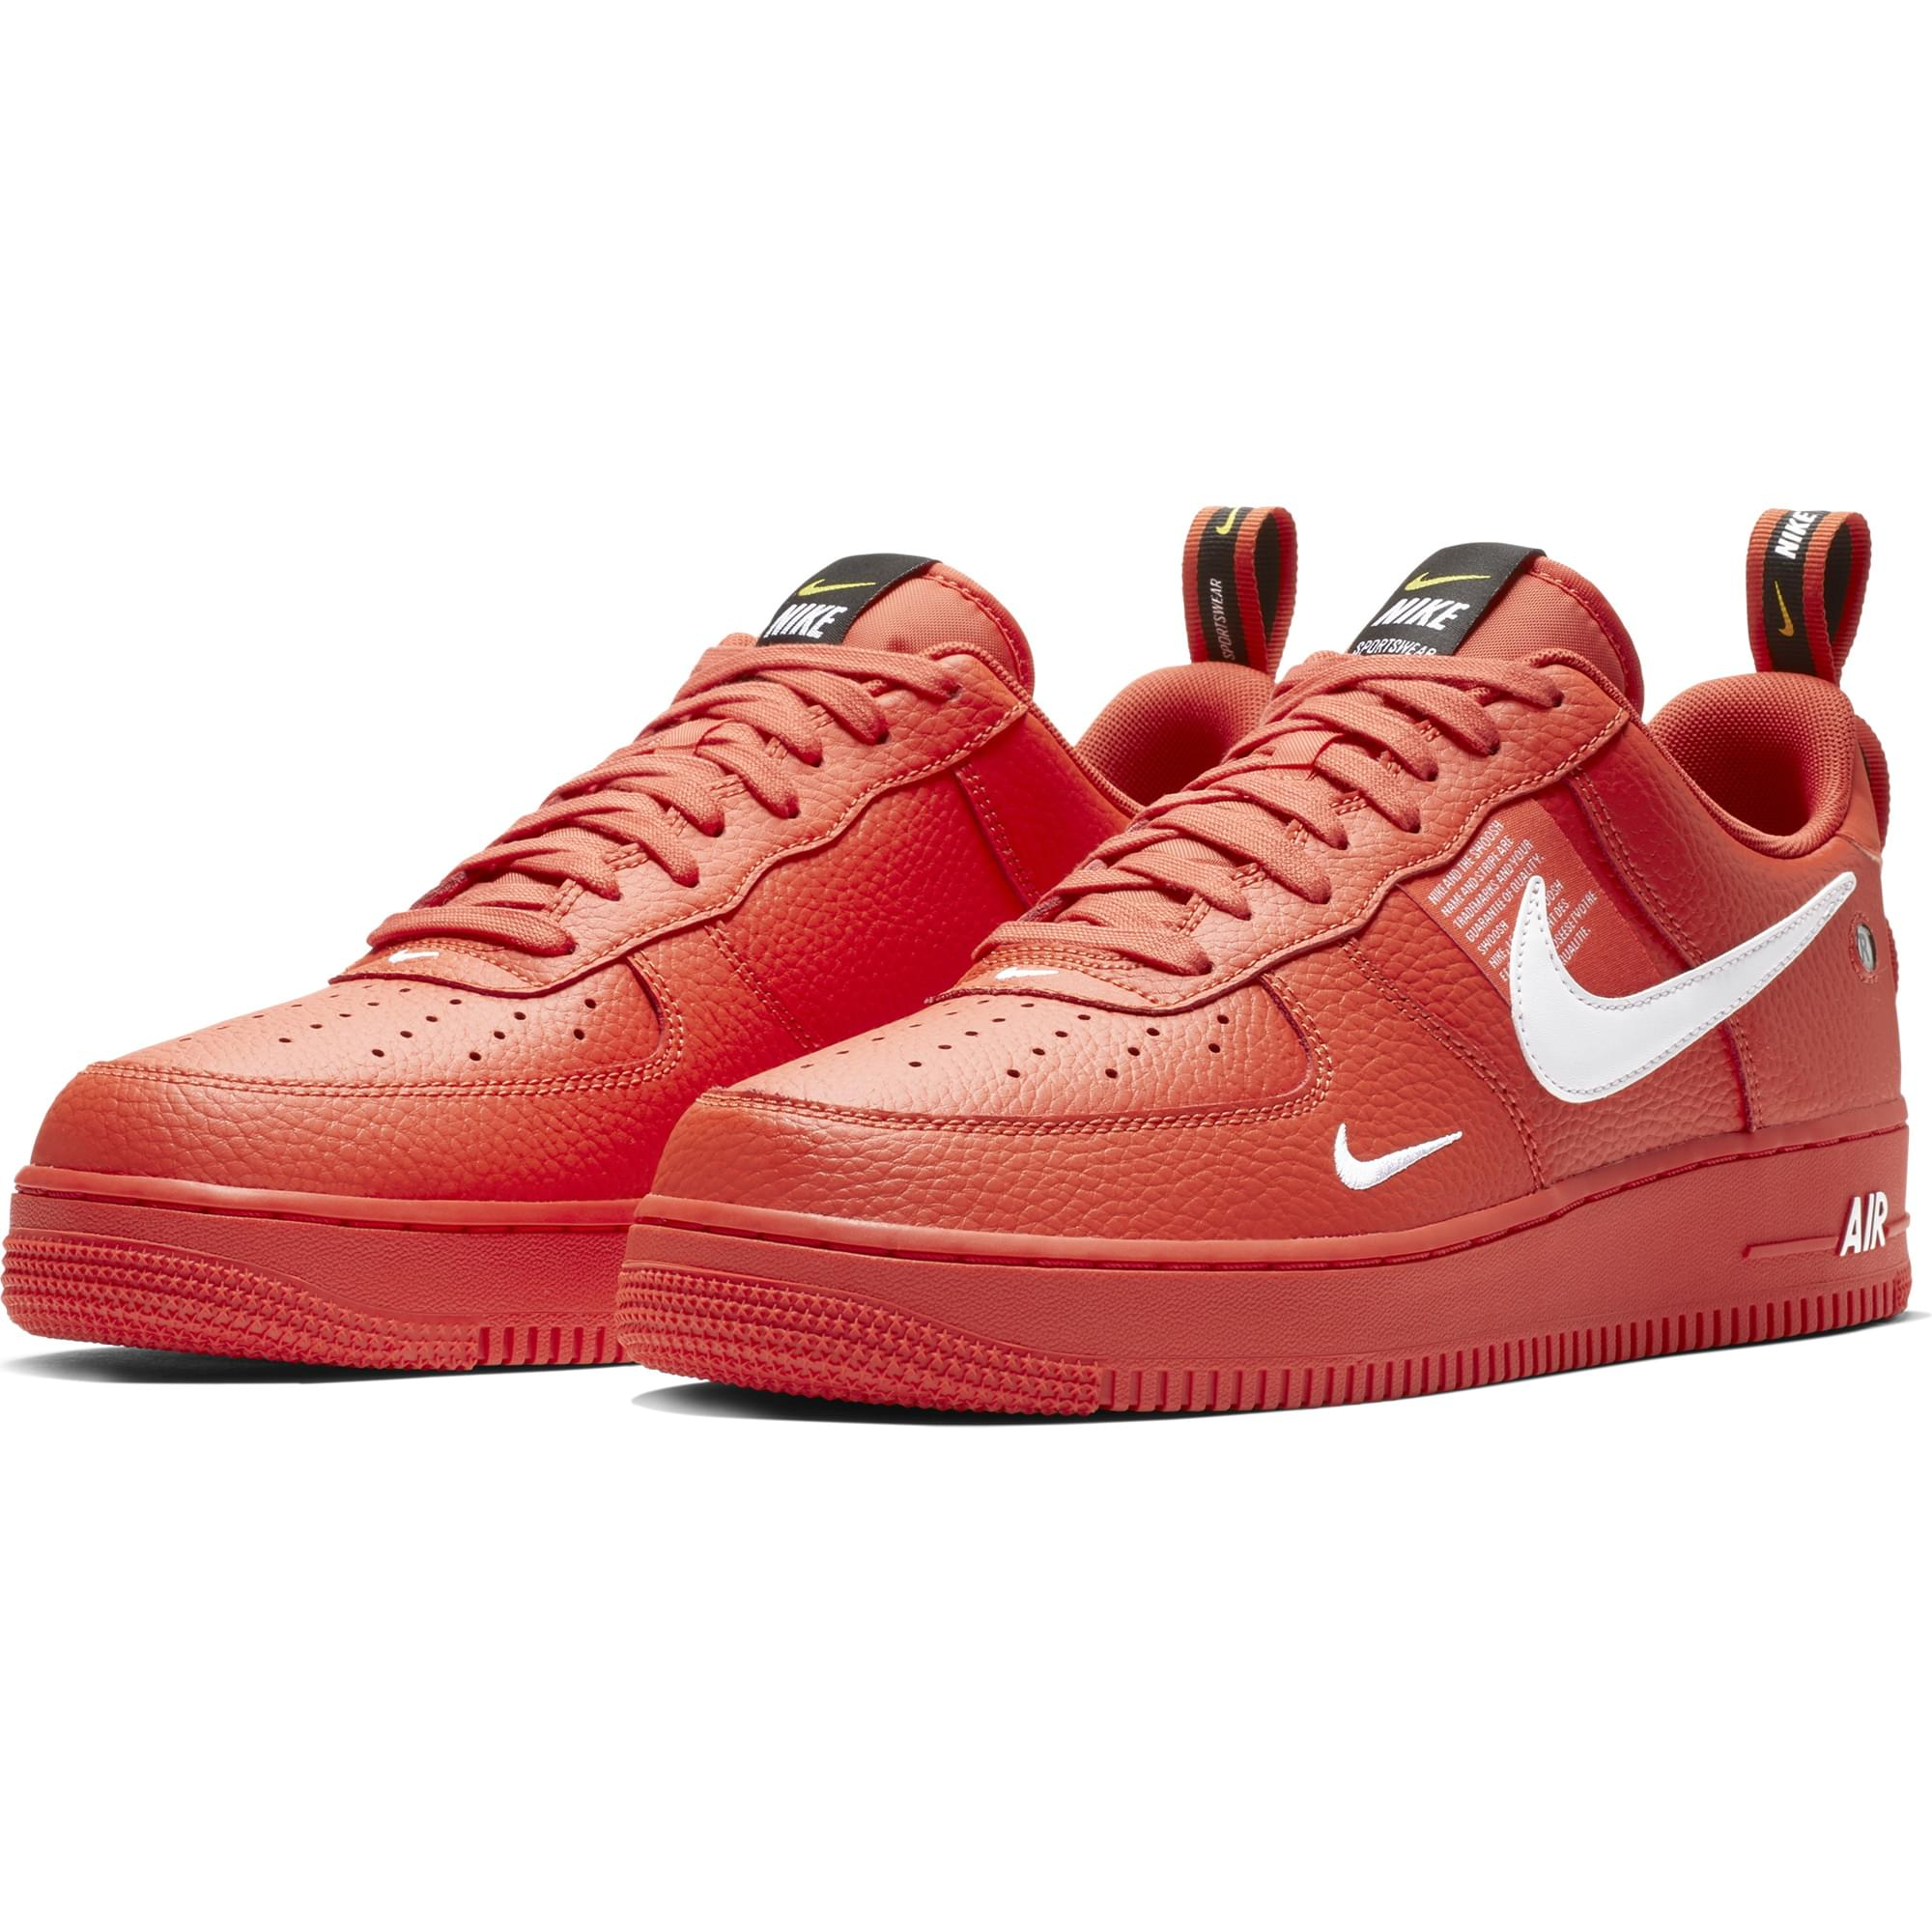 Piros Air Force 1 Cipők. Nike HU